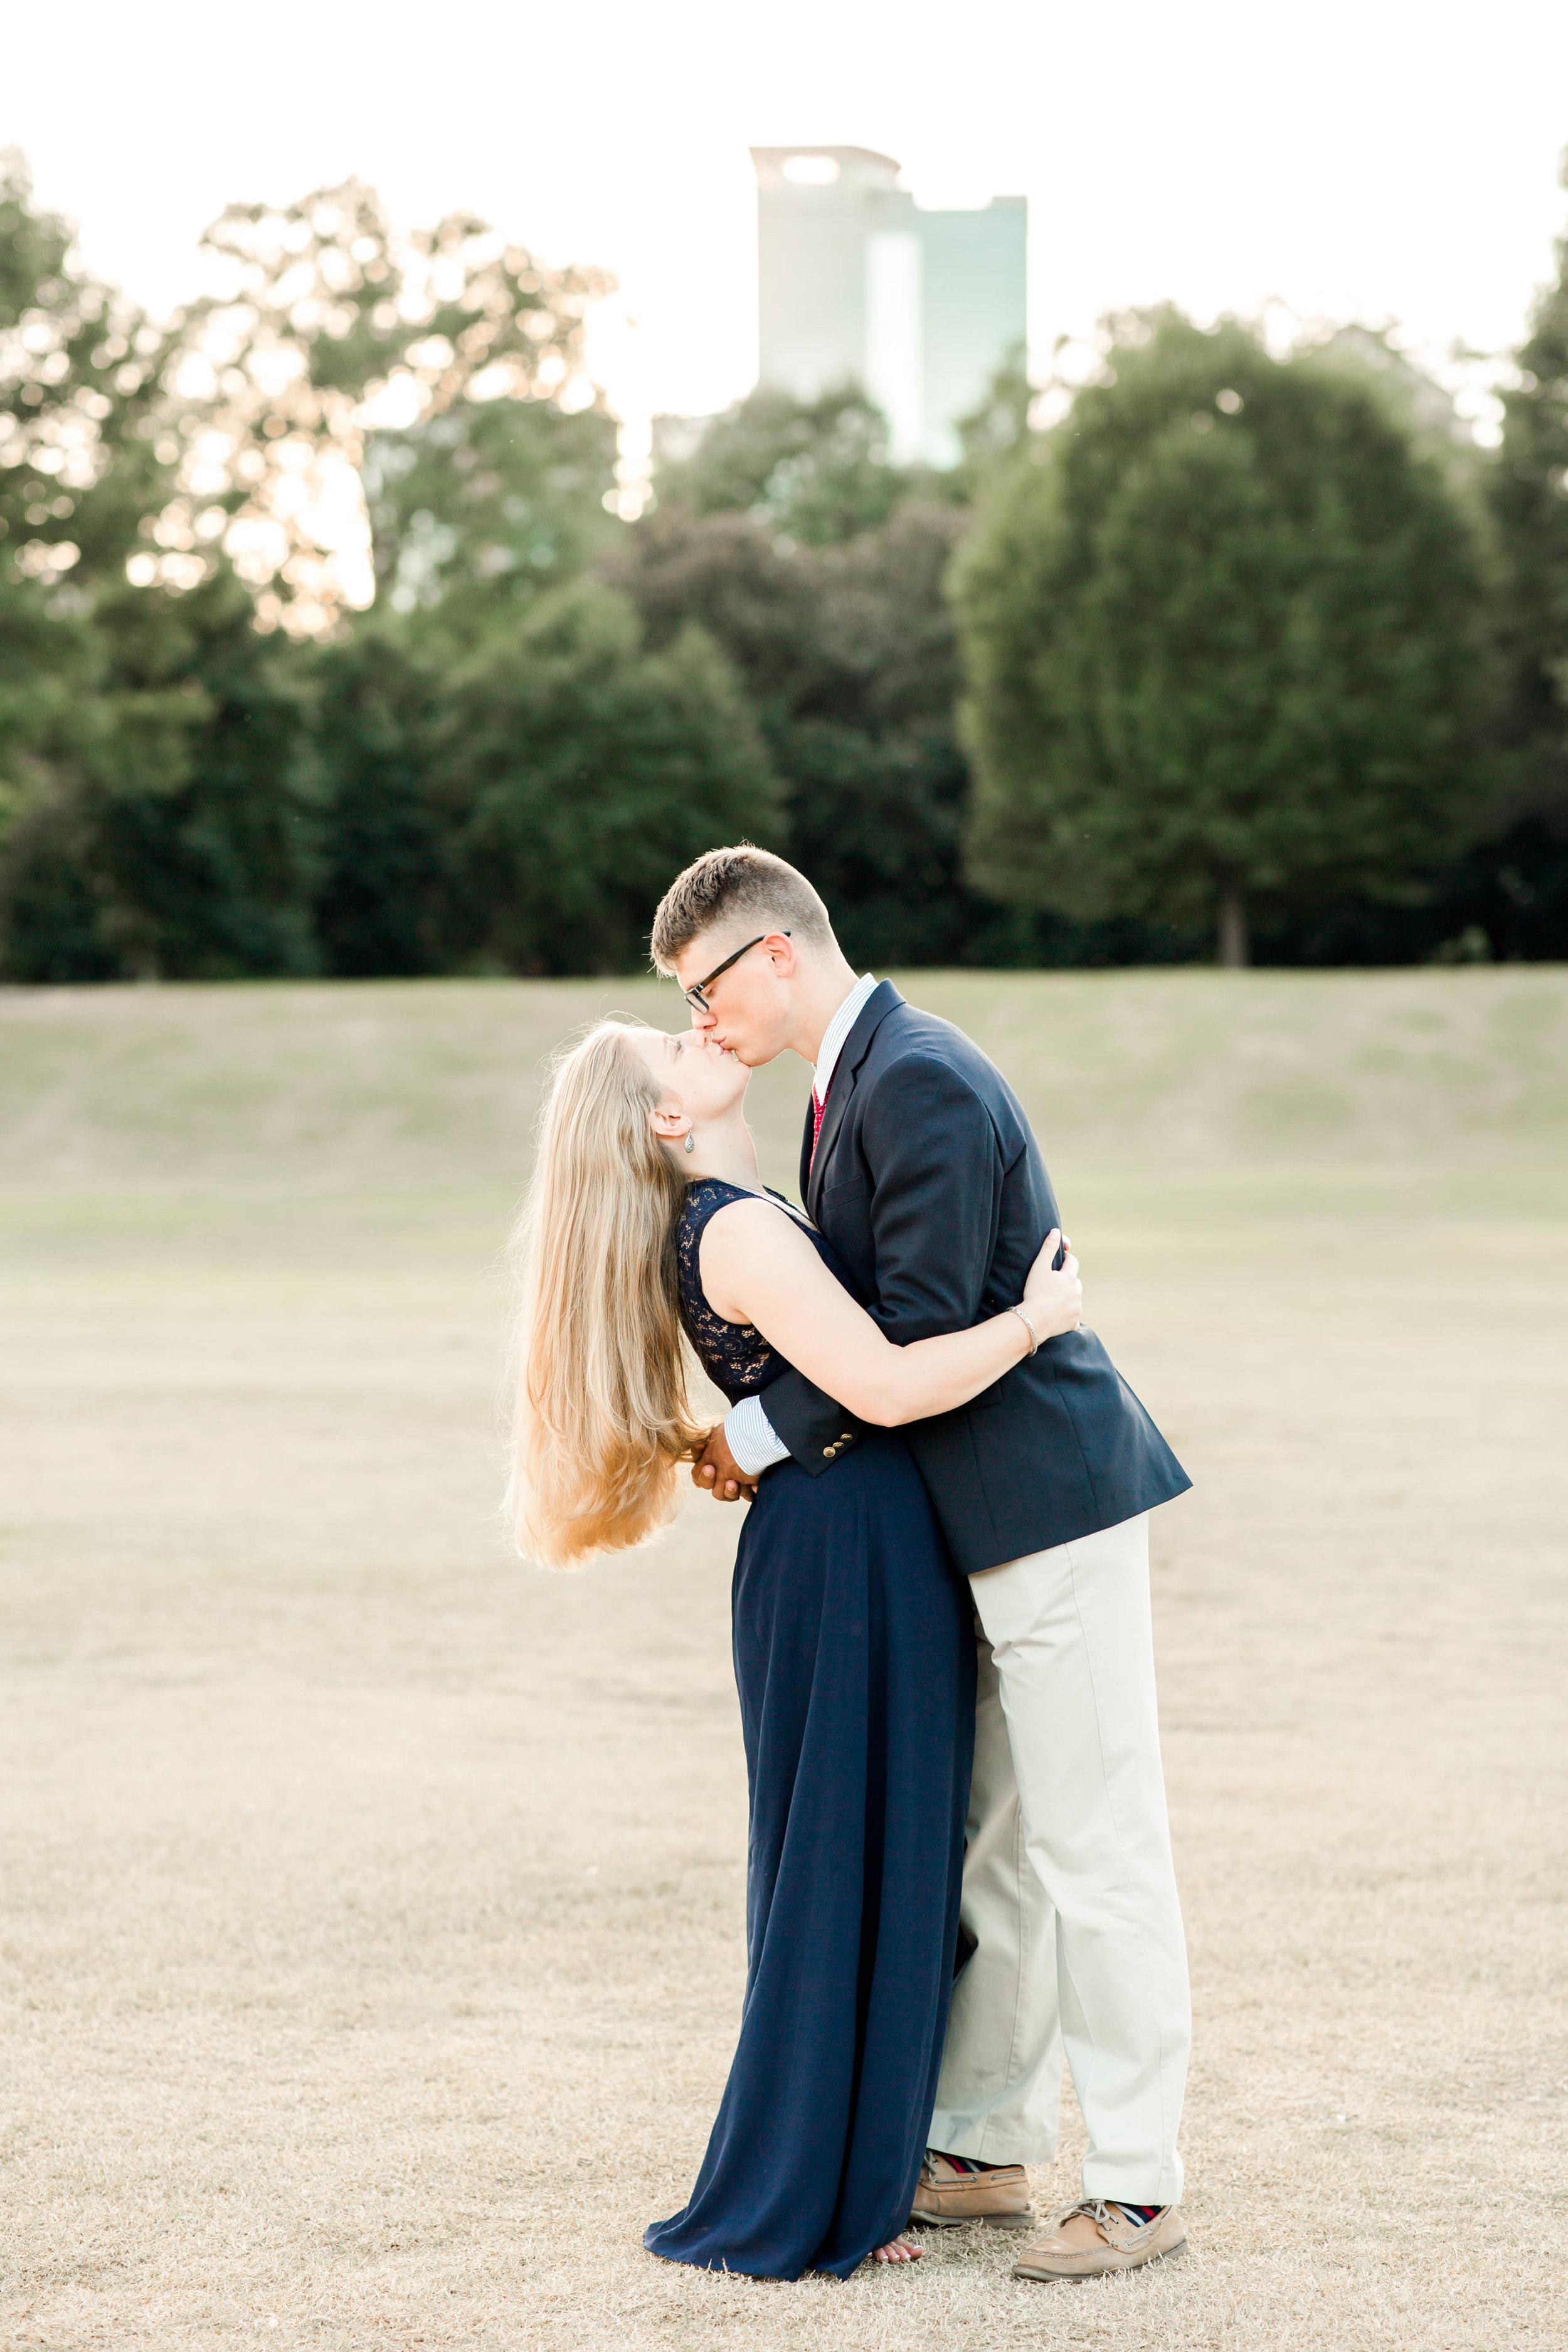 MaryElizabeth_Will_Engagement-136.JPG